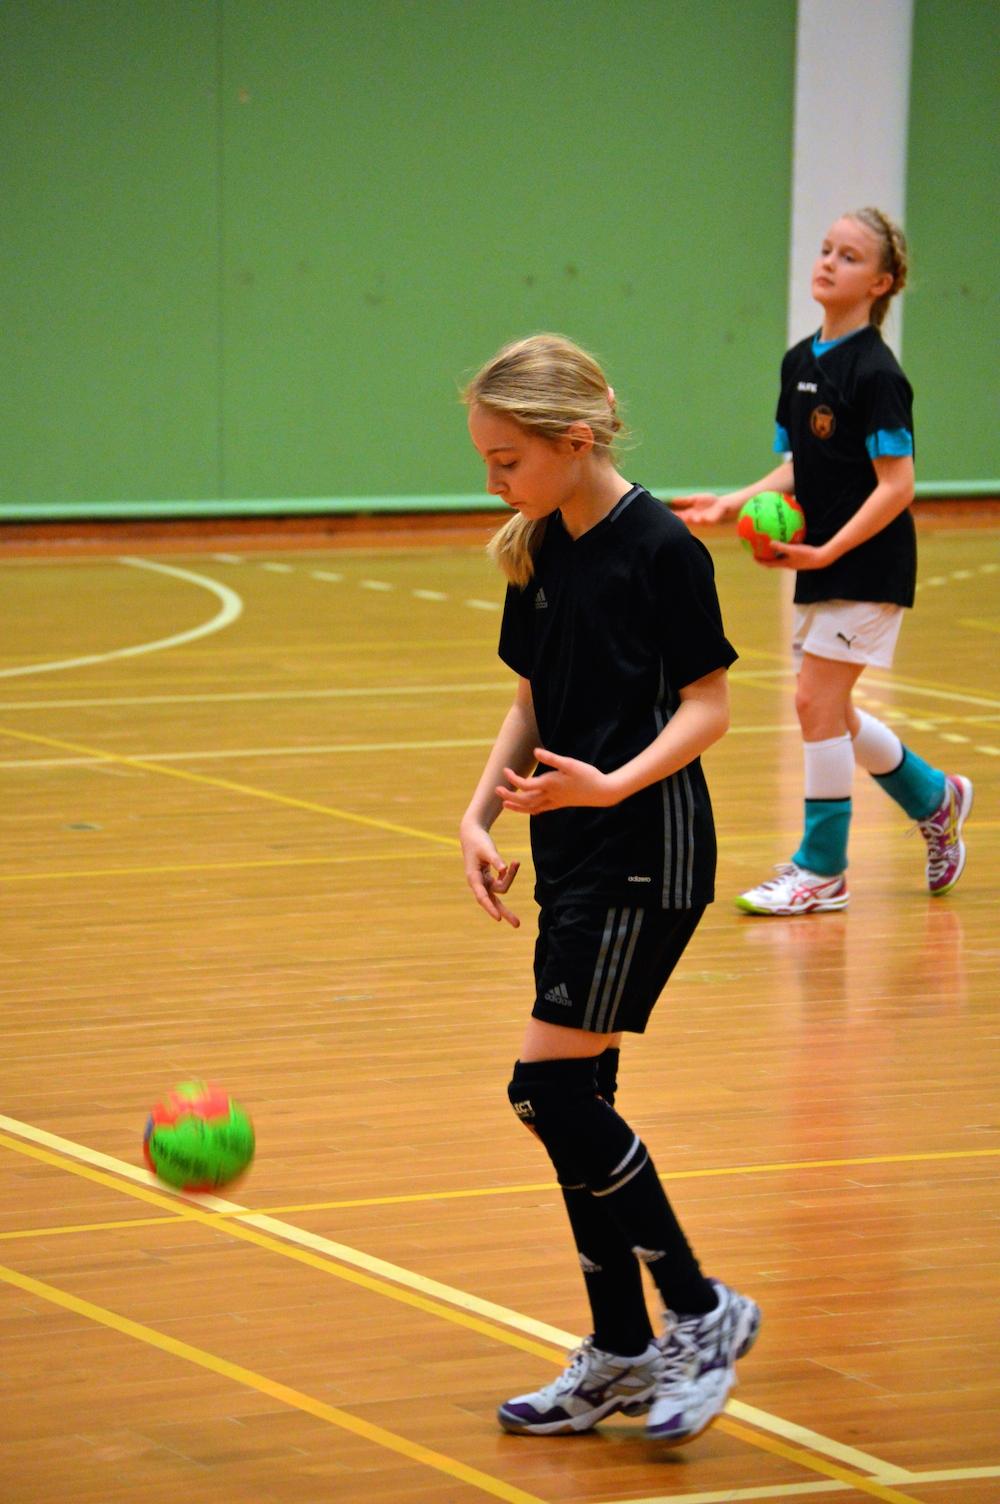 Håndboldcamp30